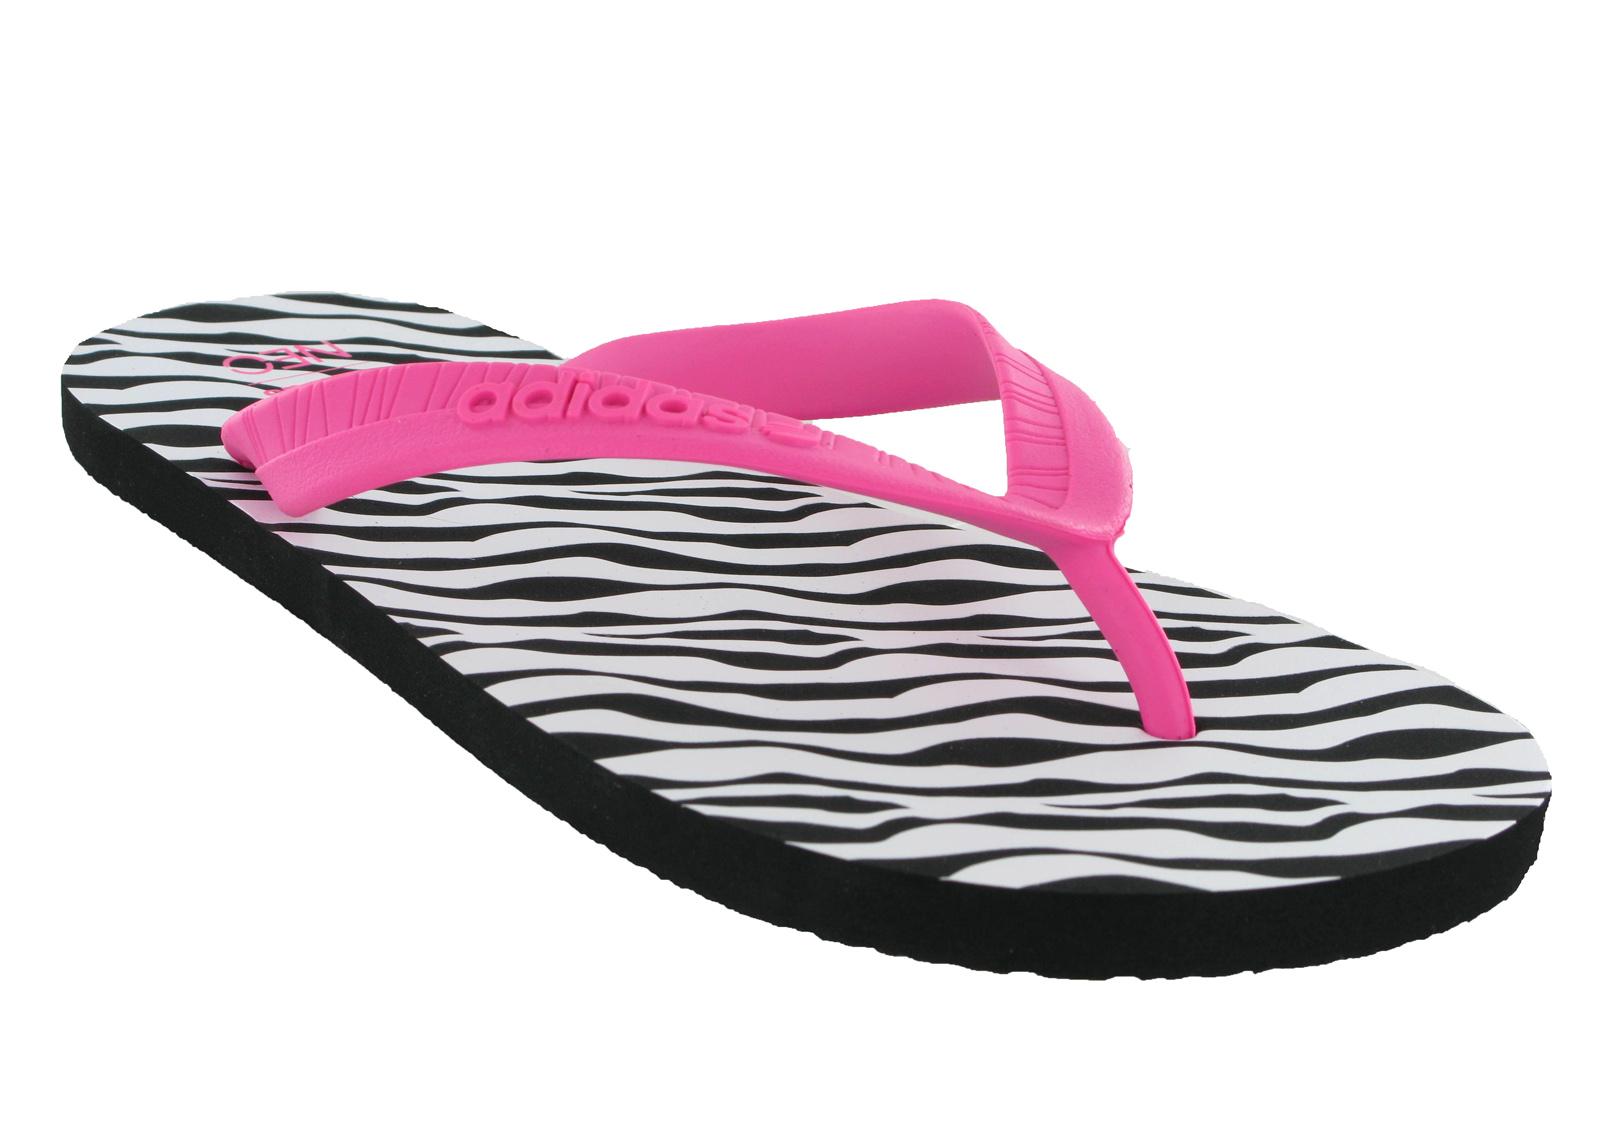 adidas flipper womens flip flop thong sandals toepost pool summer beach holiday ebay. Black Bedroom Furniture Sets. Home Design Ideas